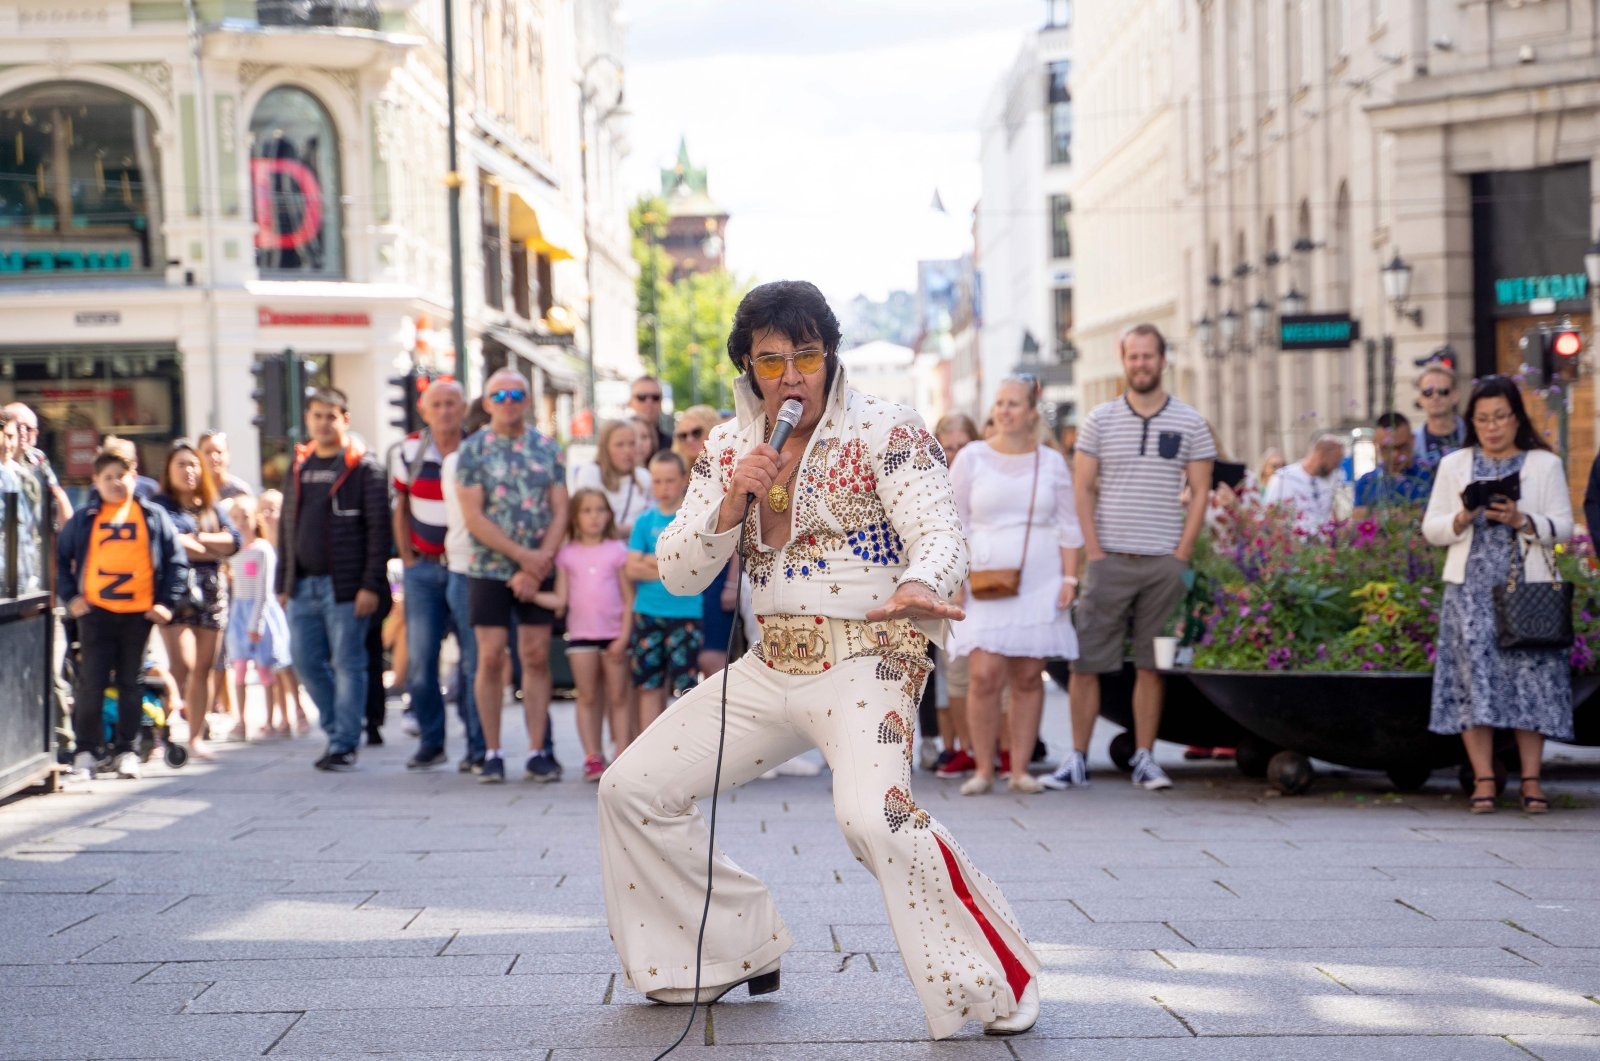 Norwegian artist Kjell Elvis (Kjell Henning Bjornestad) performs in central Oslo in an attempt to beat the record of the world's longest Elvis Presley singing marathon in Oslo, Norway on July 23, 2020. (AFP Photo)